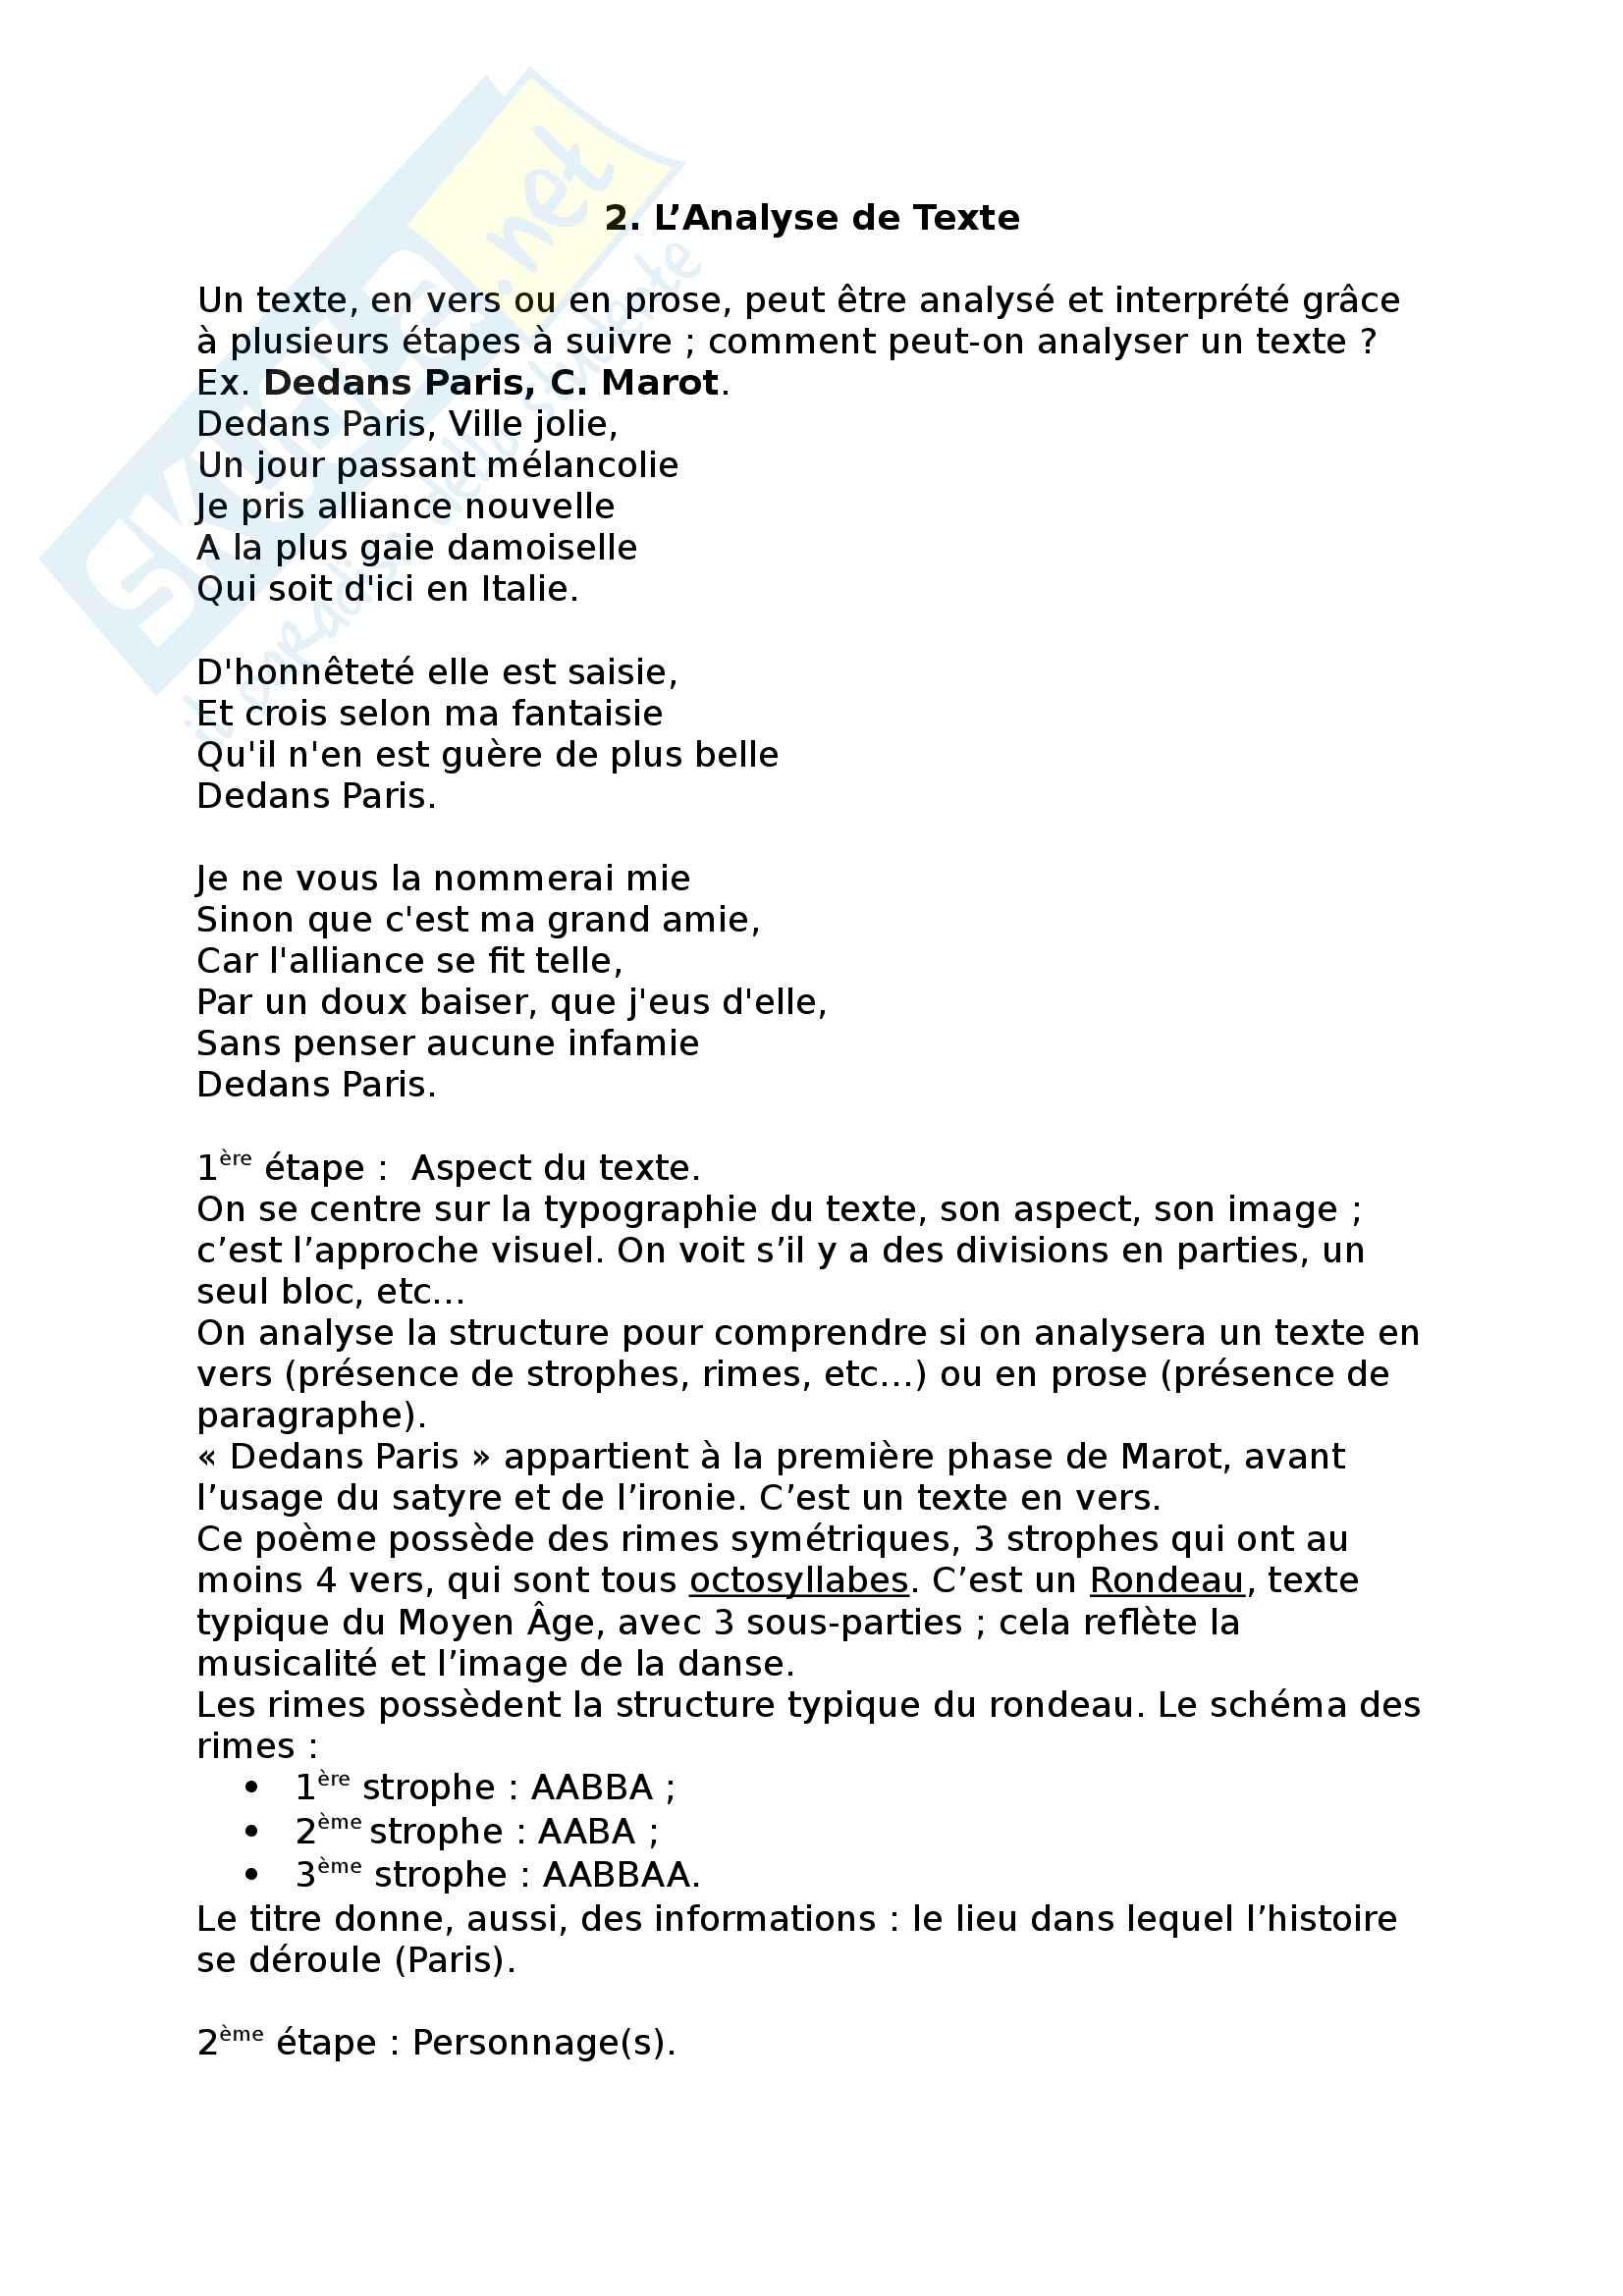 2. L' Analyse de Texte (Ex Dedans Paris, C. Marot)